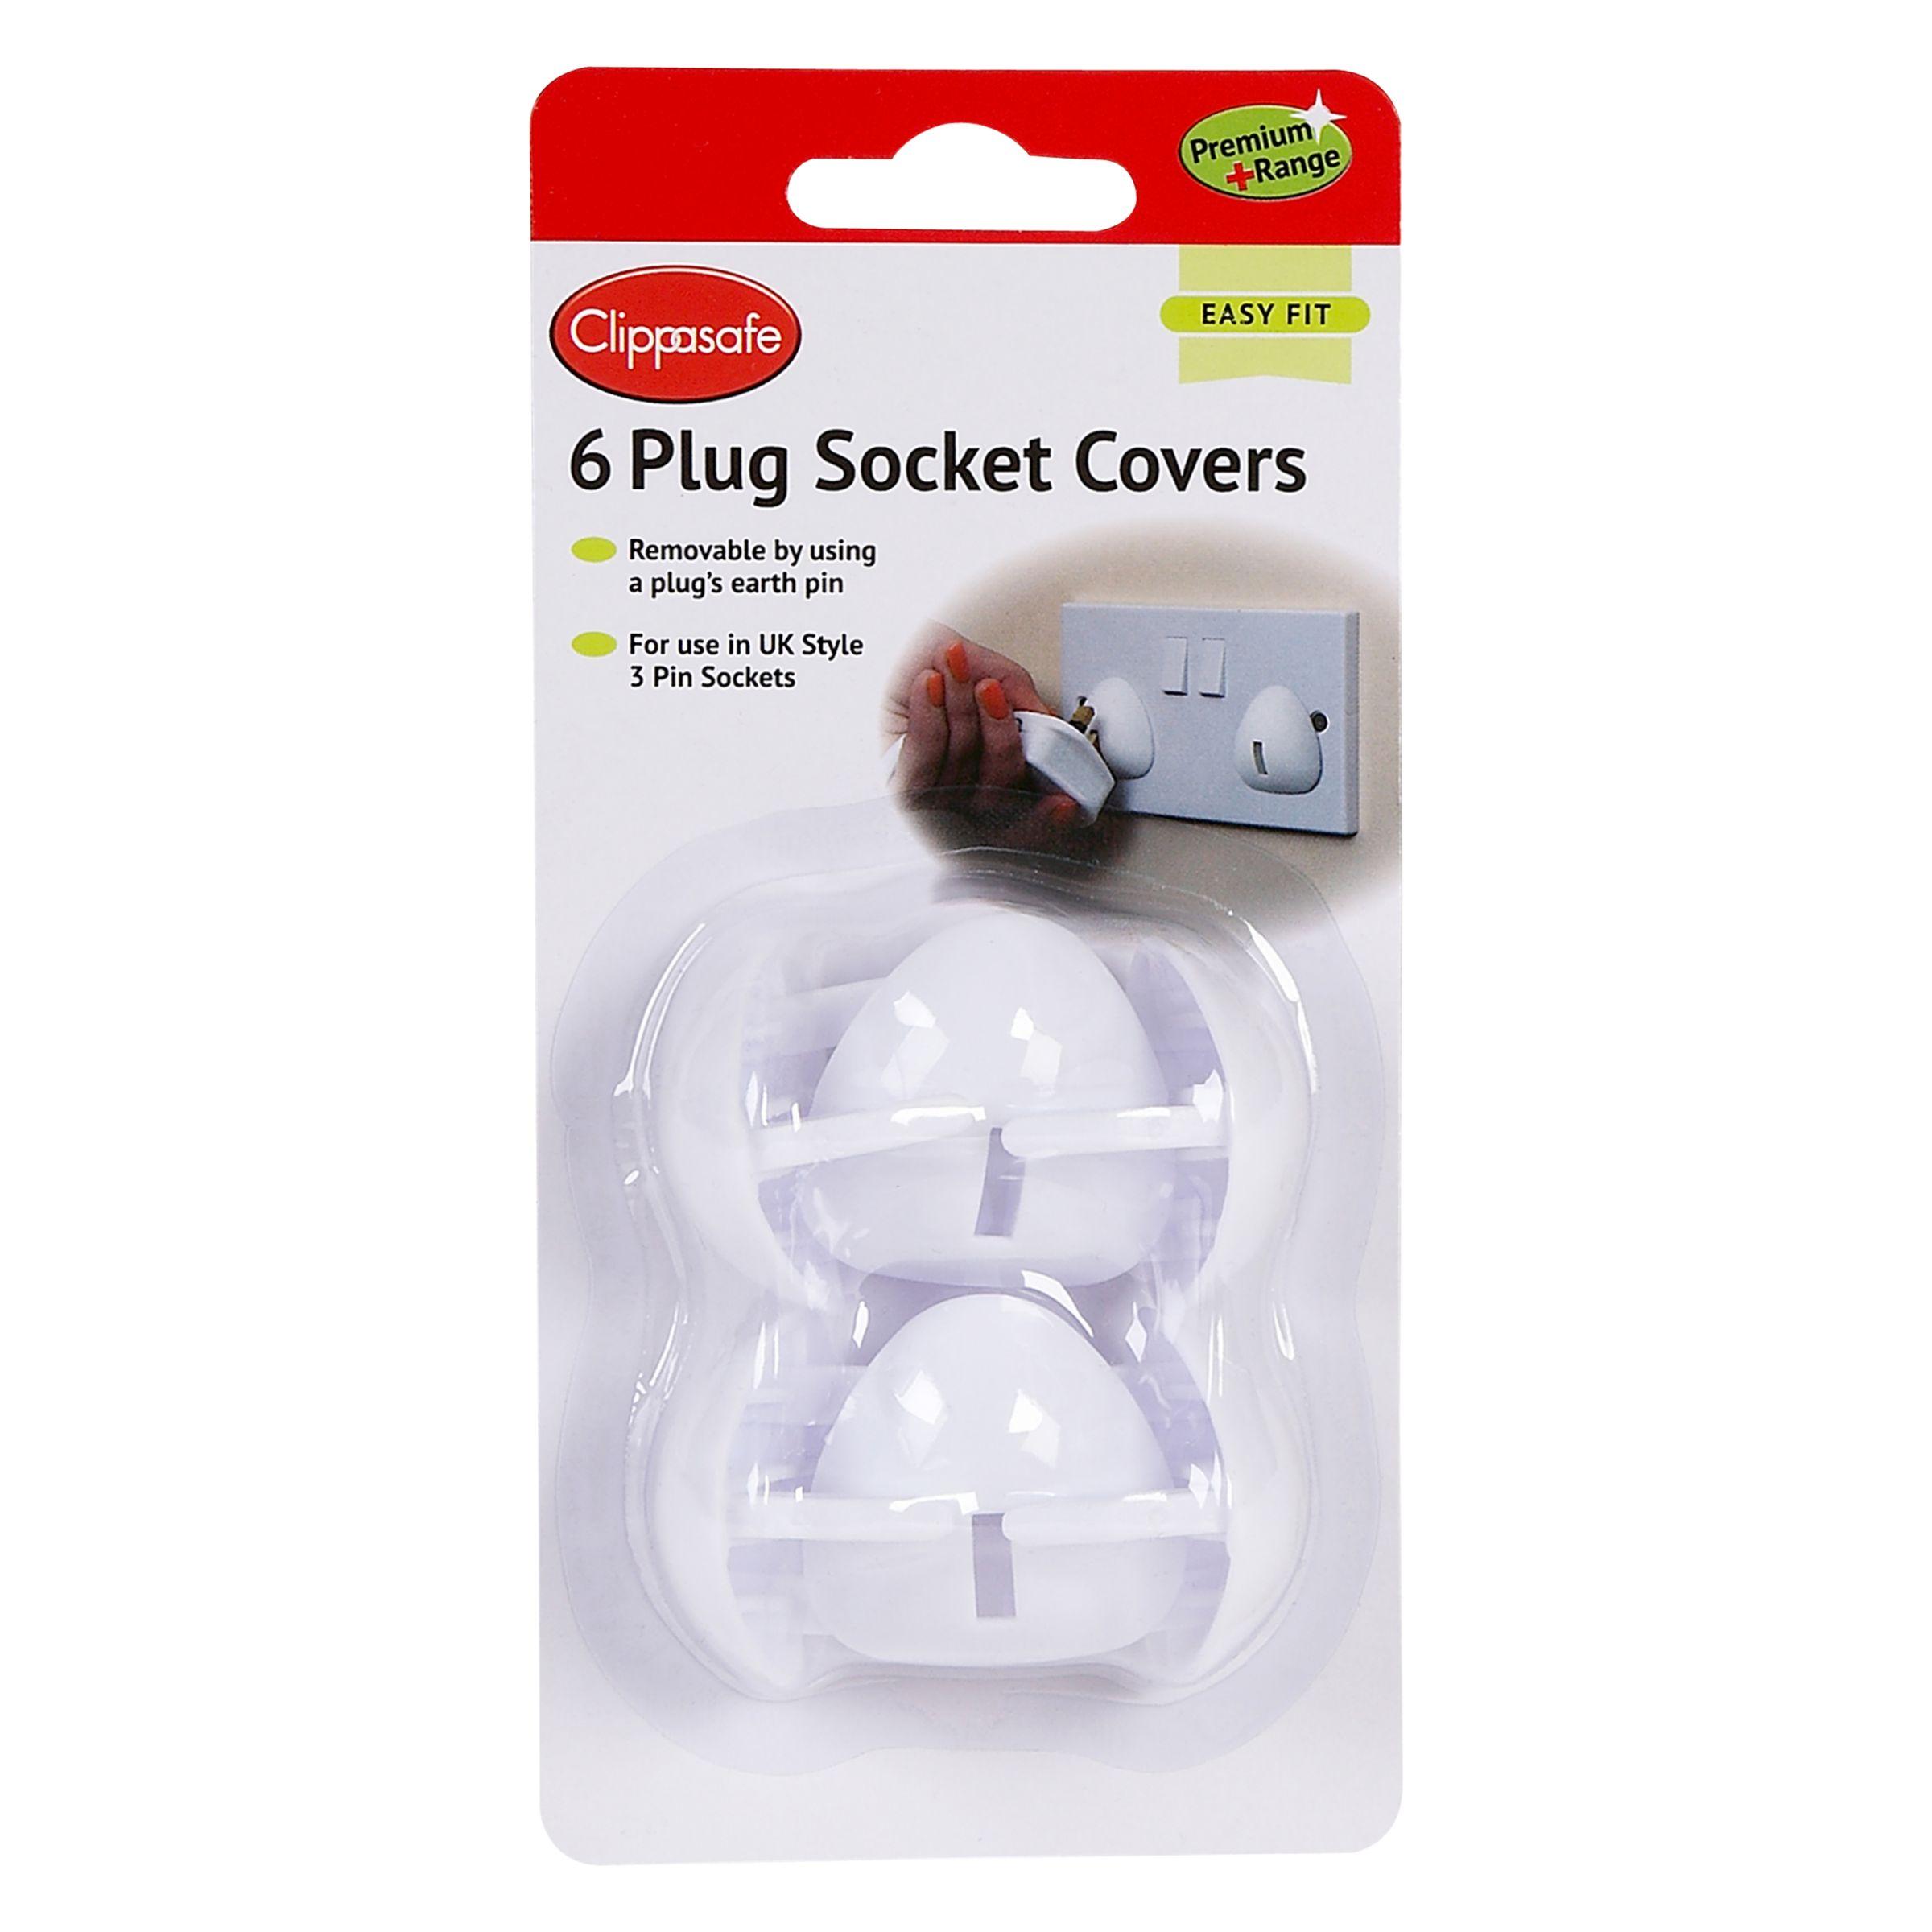 Clippasafe Clippasafe Plug Socket Covers, Pack of 6, White